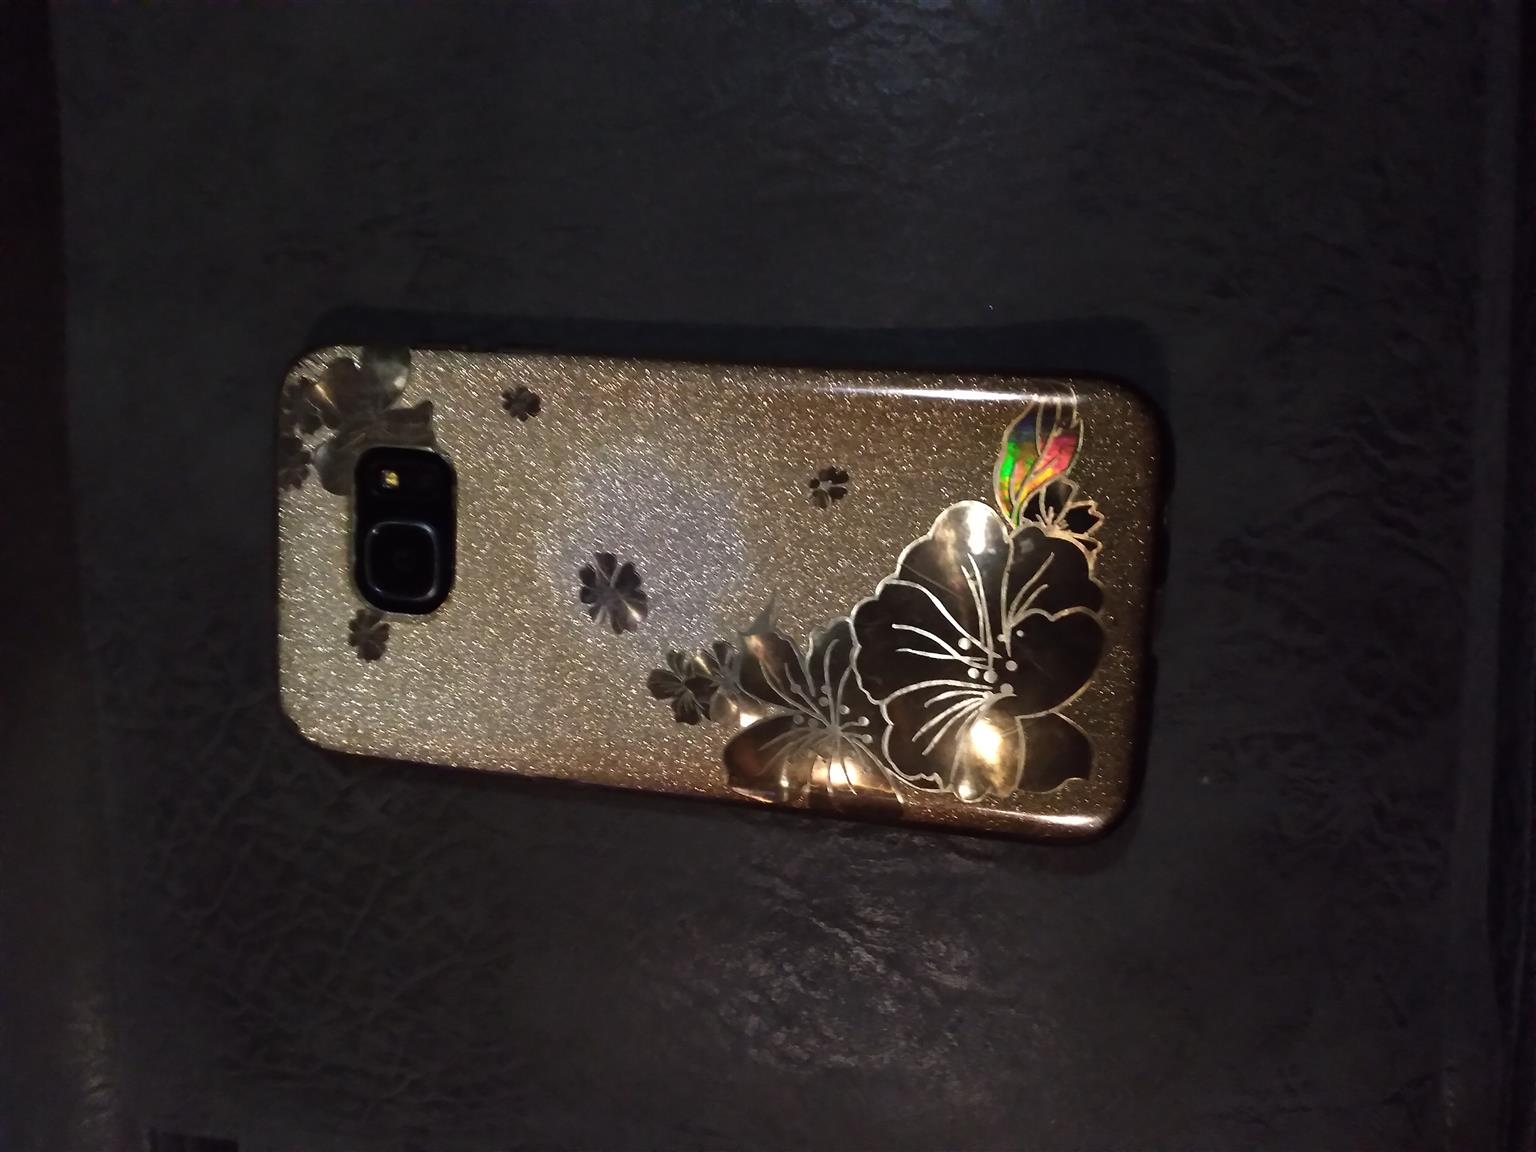 Samsung S7 used phone